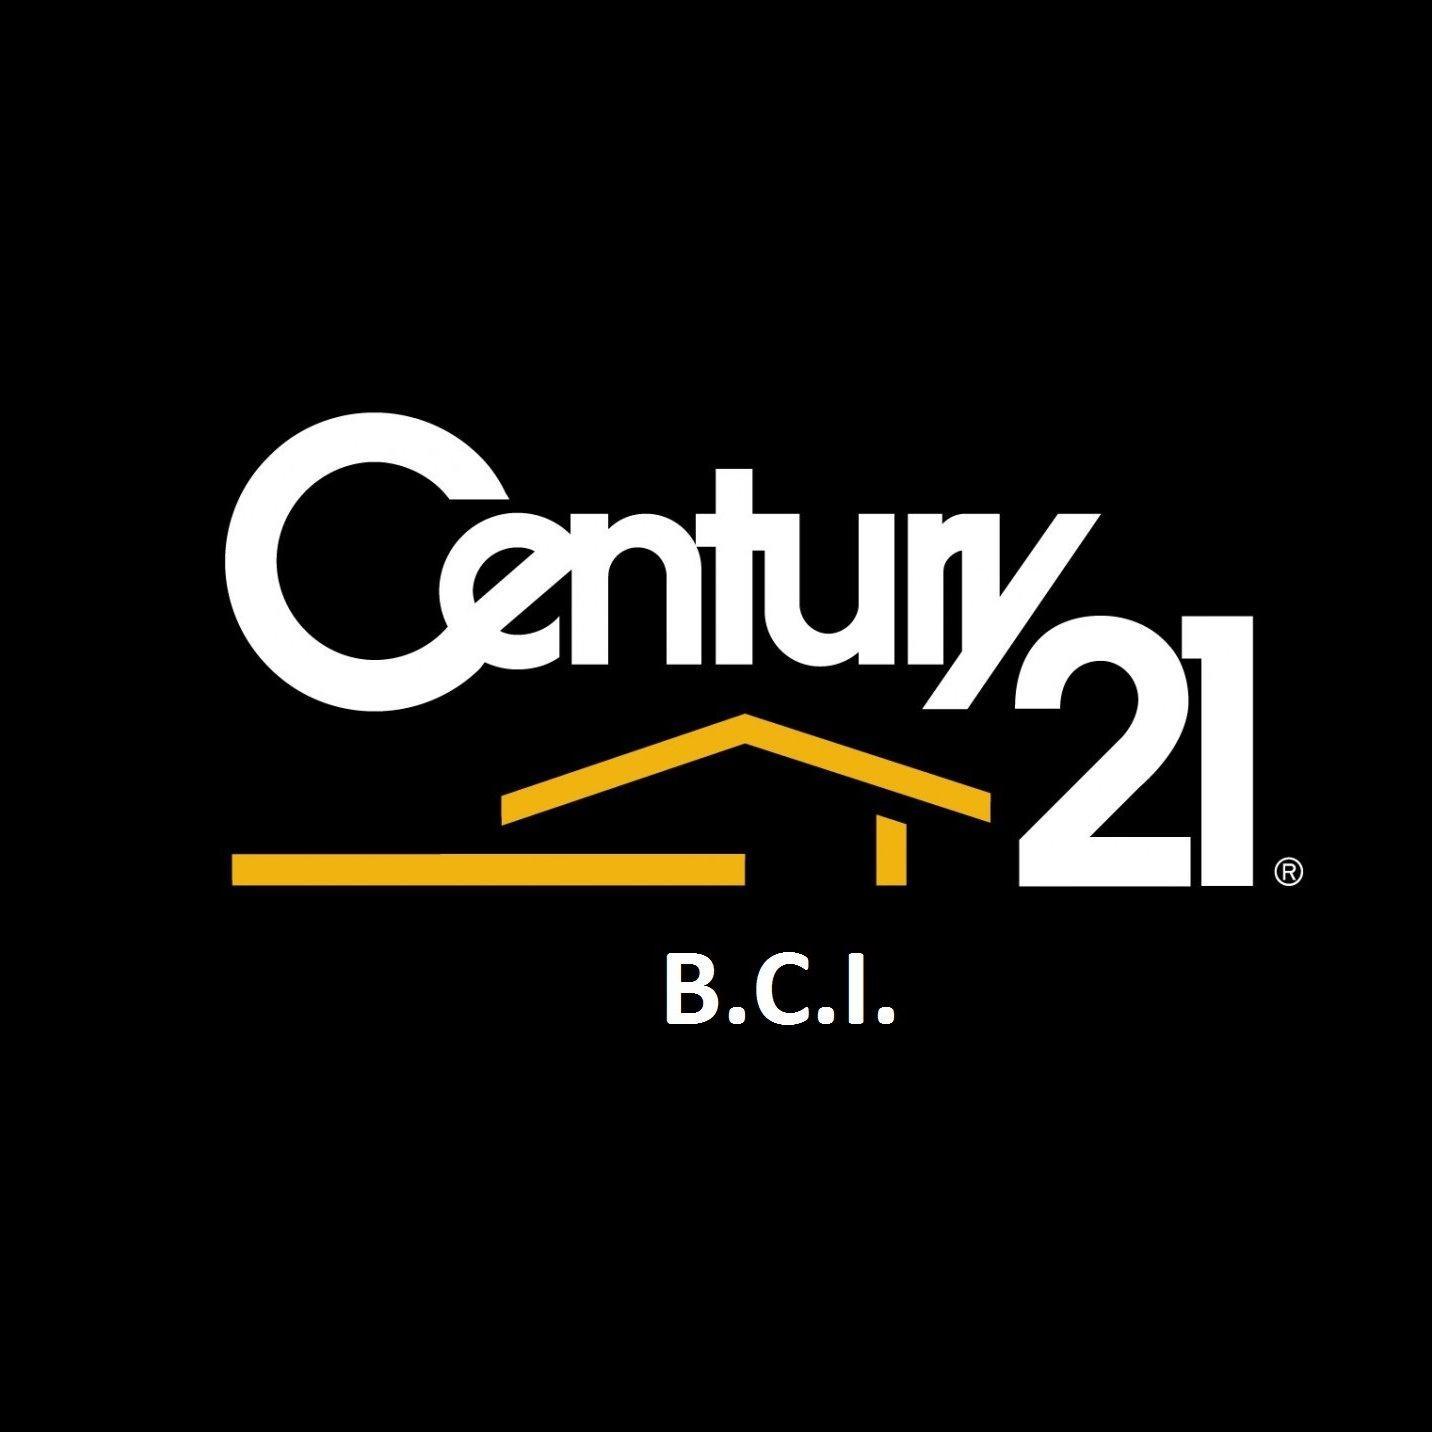 CENTURY 21 B.C.I. THUIN